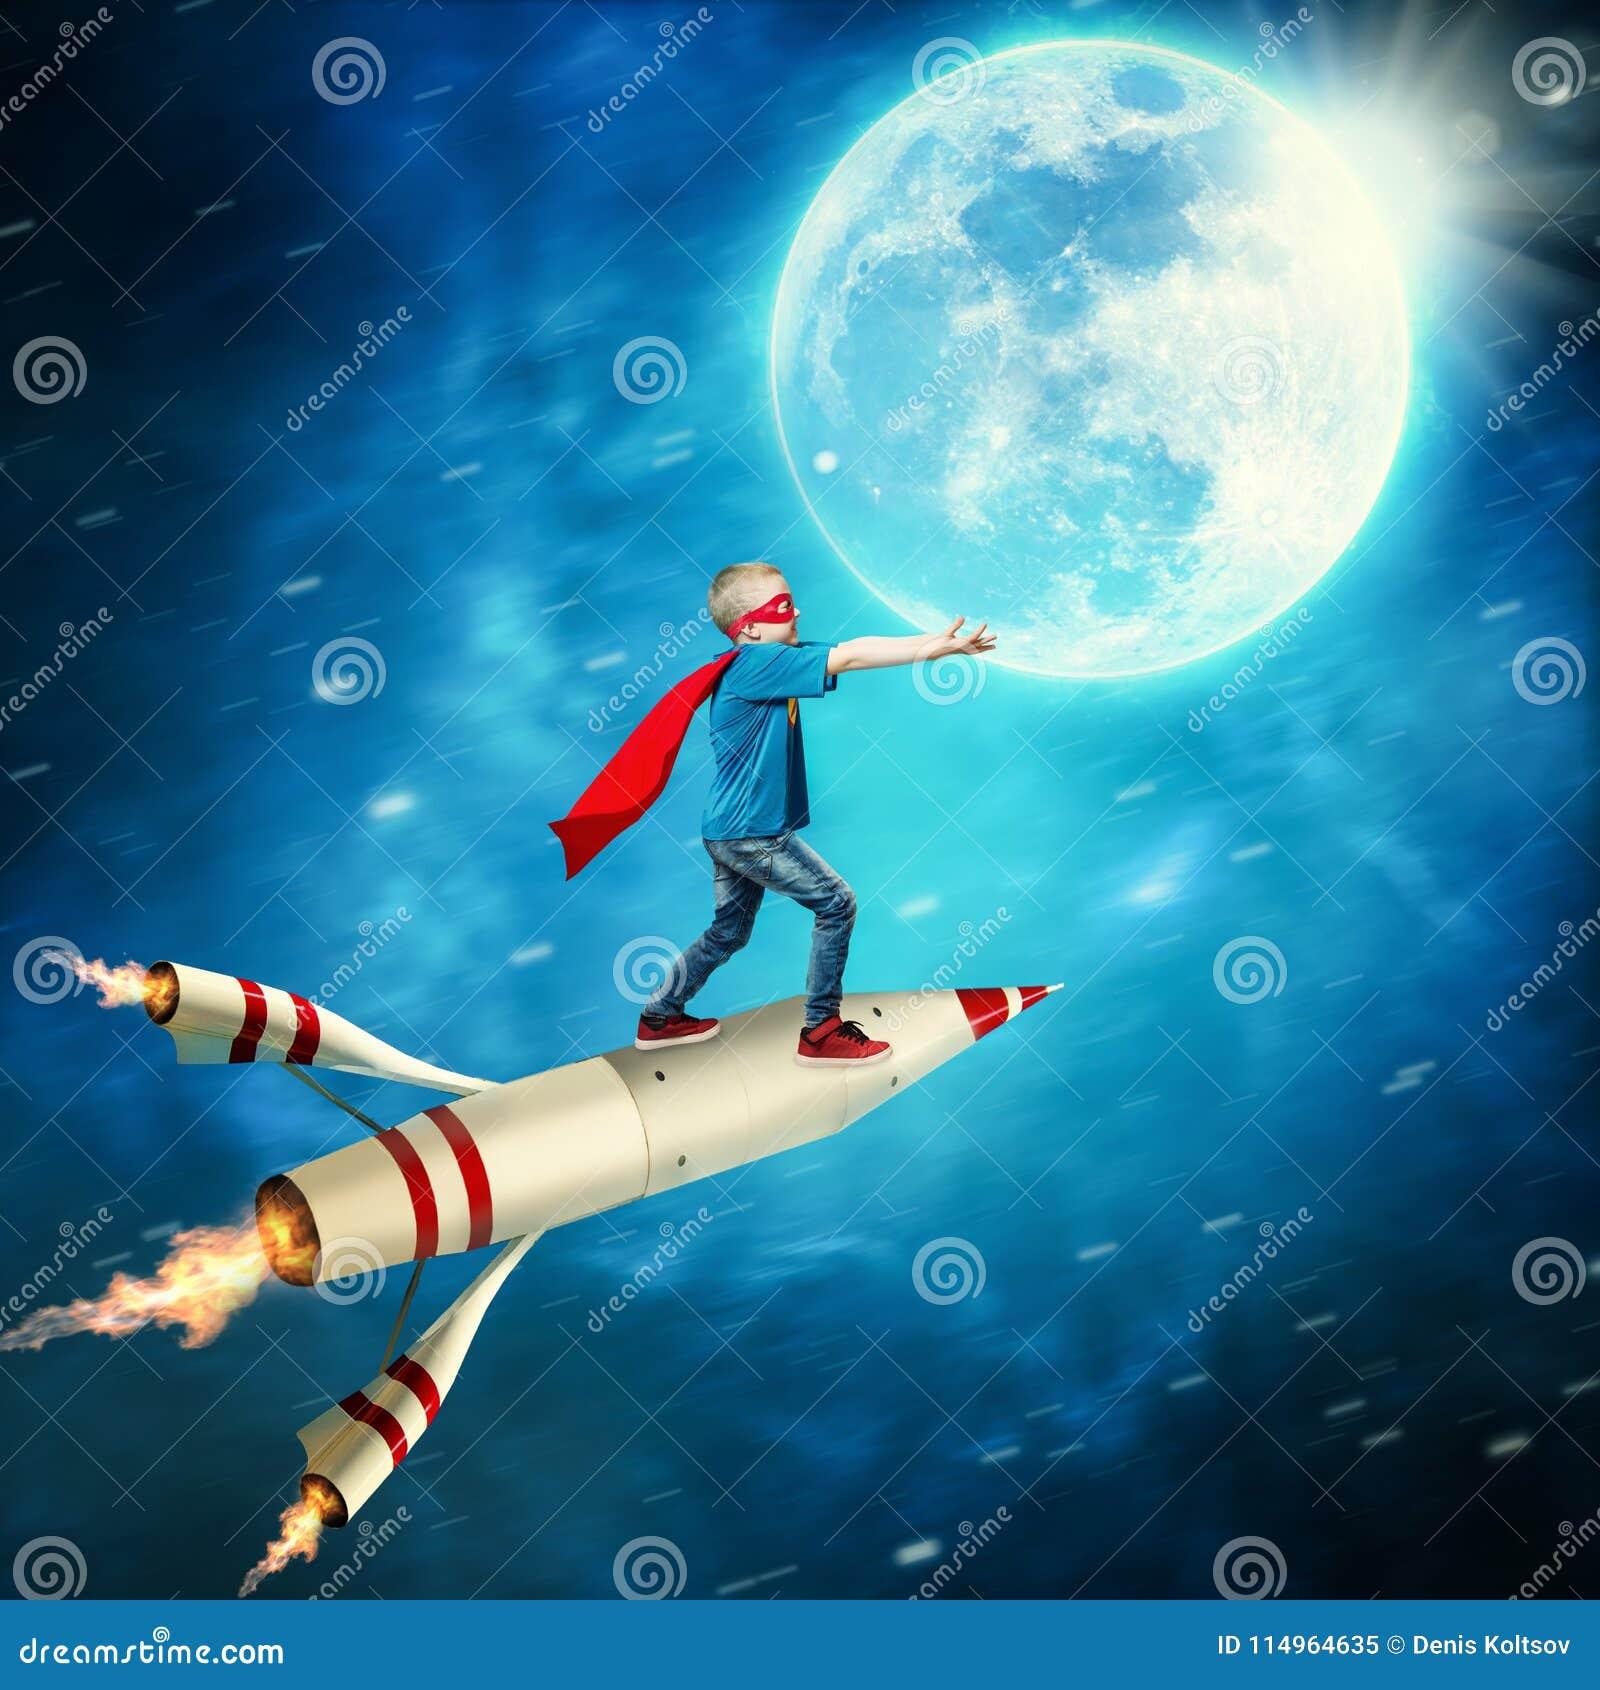 Boy in superhero costume guard the planet.